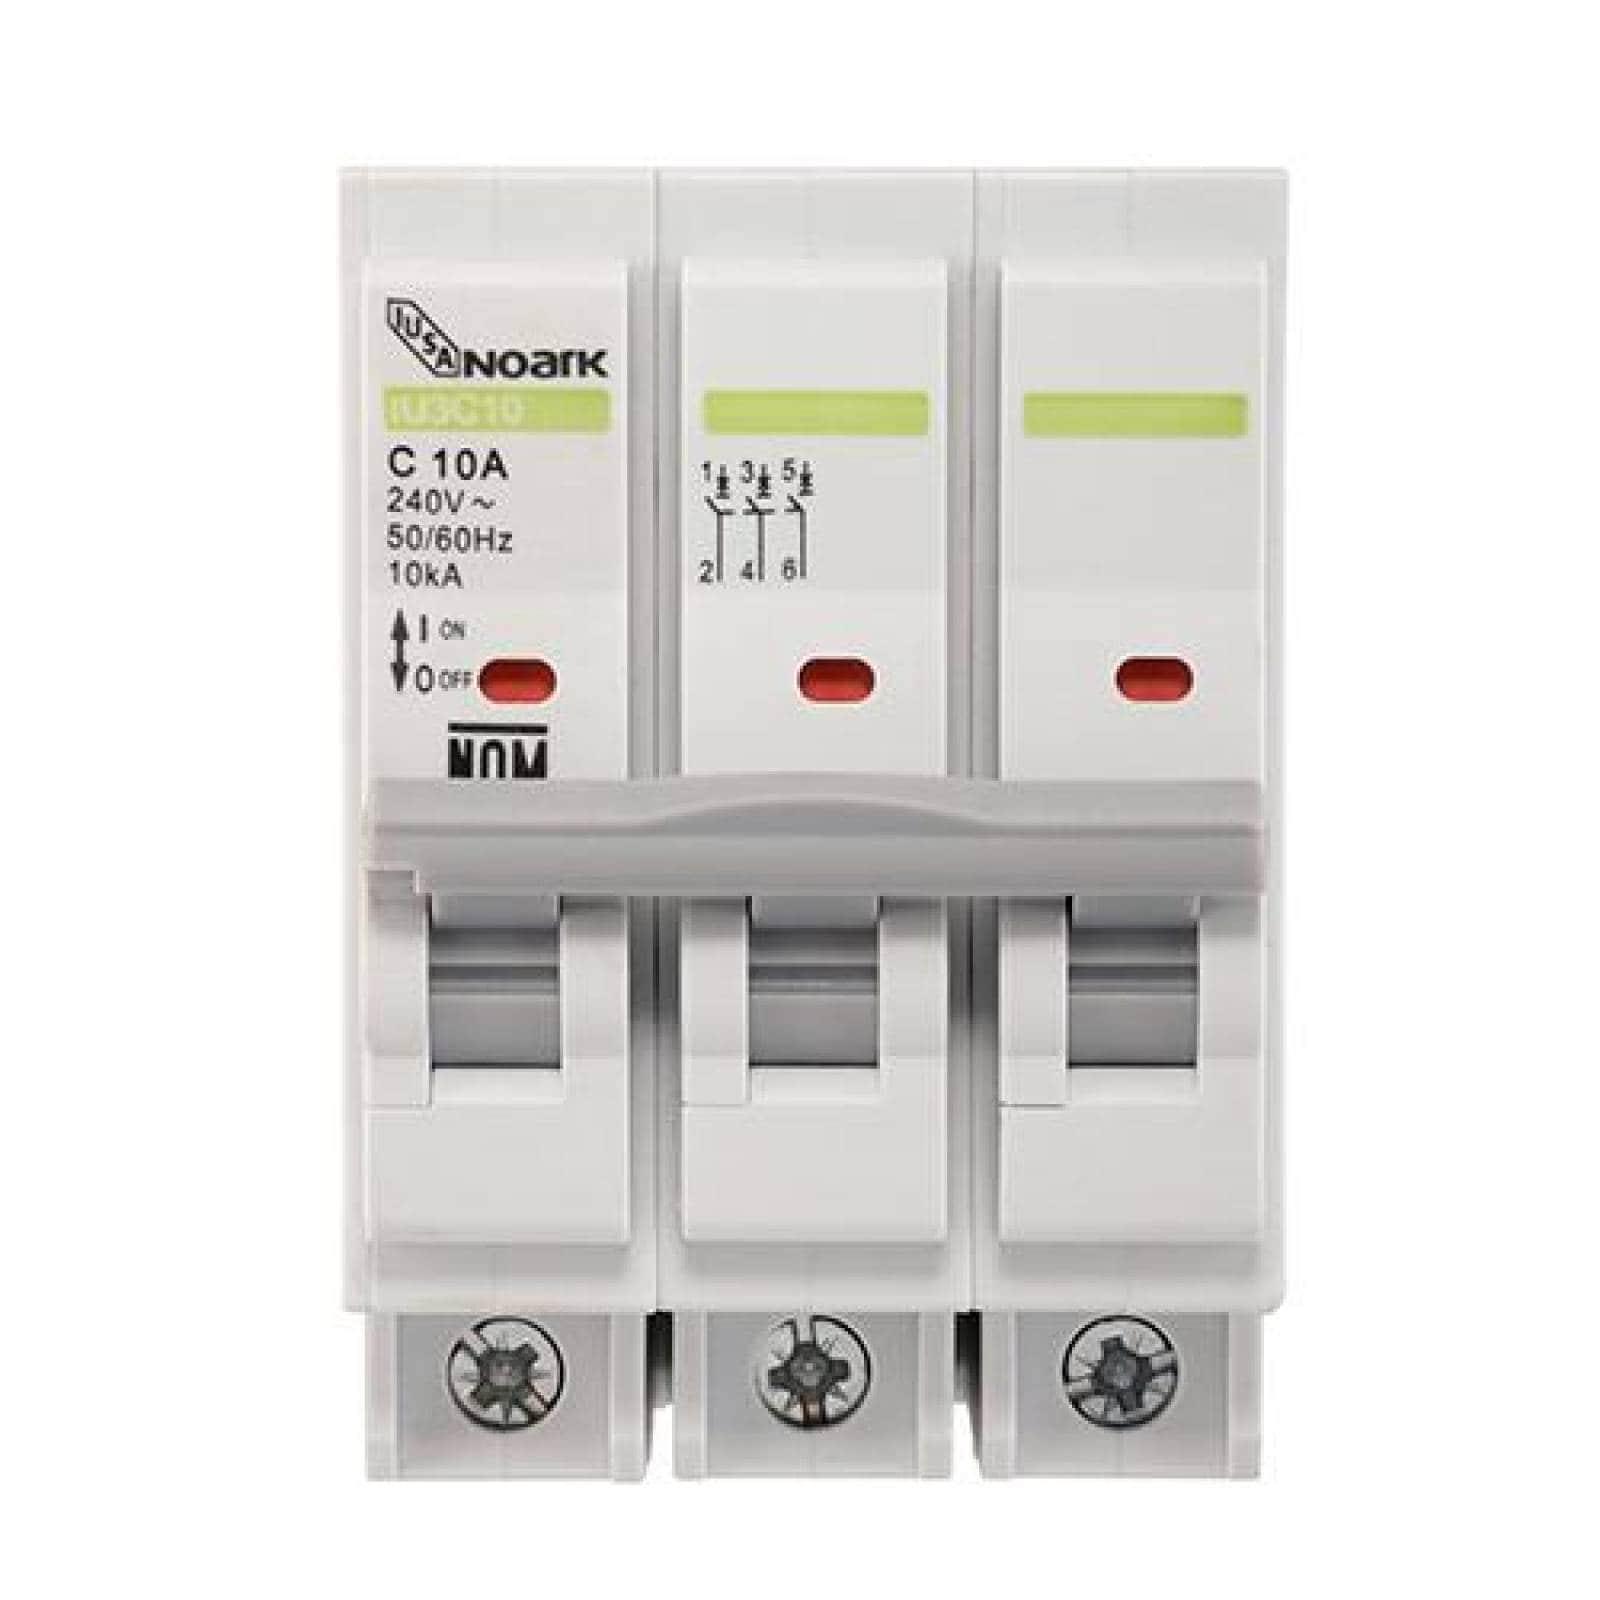 Interruptor termomagnético 3 polos 60 A